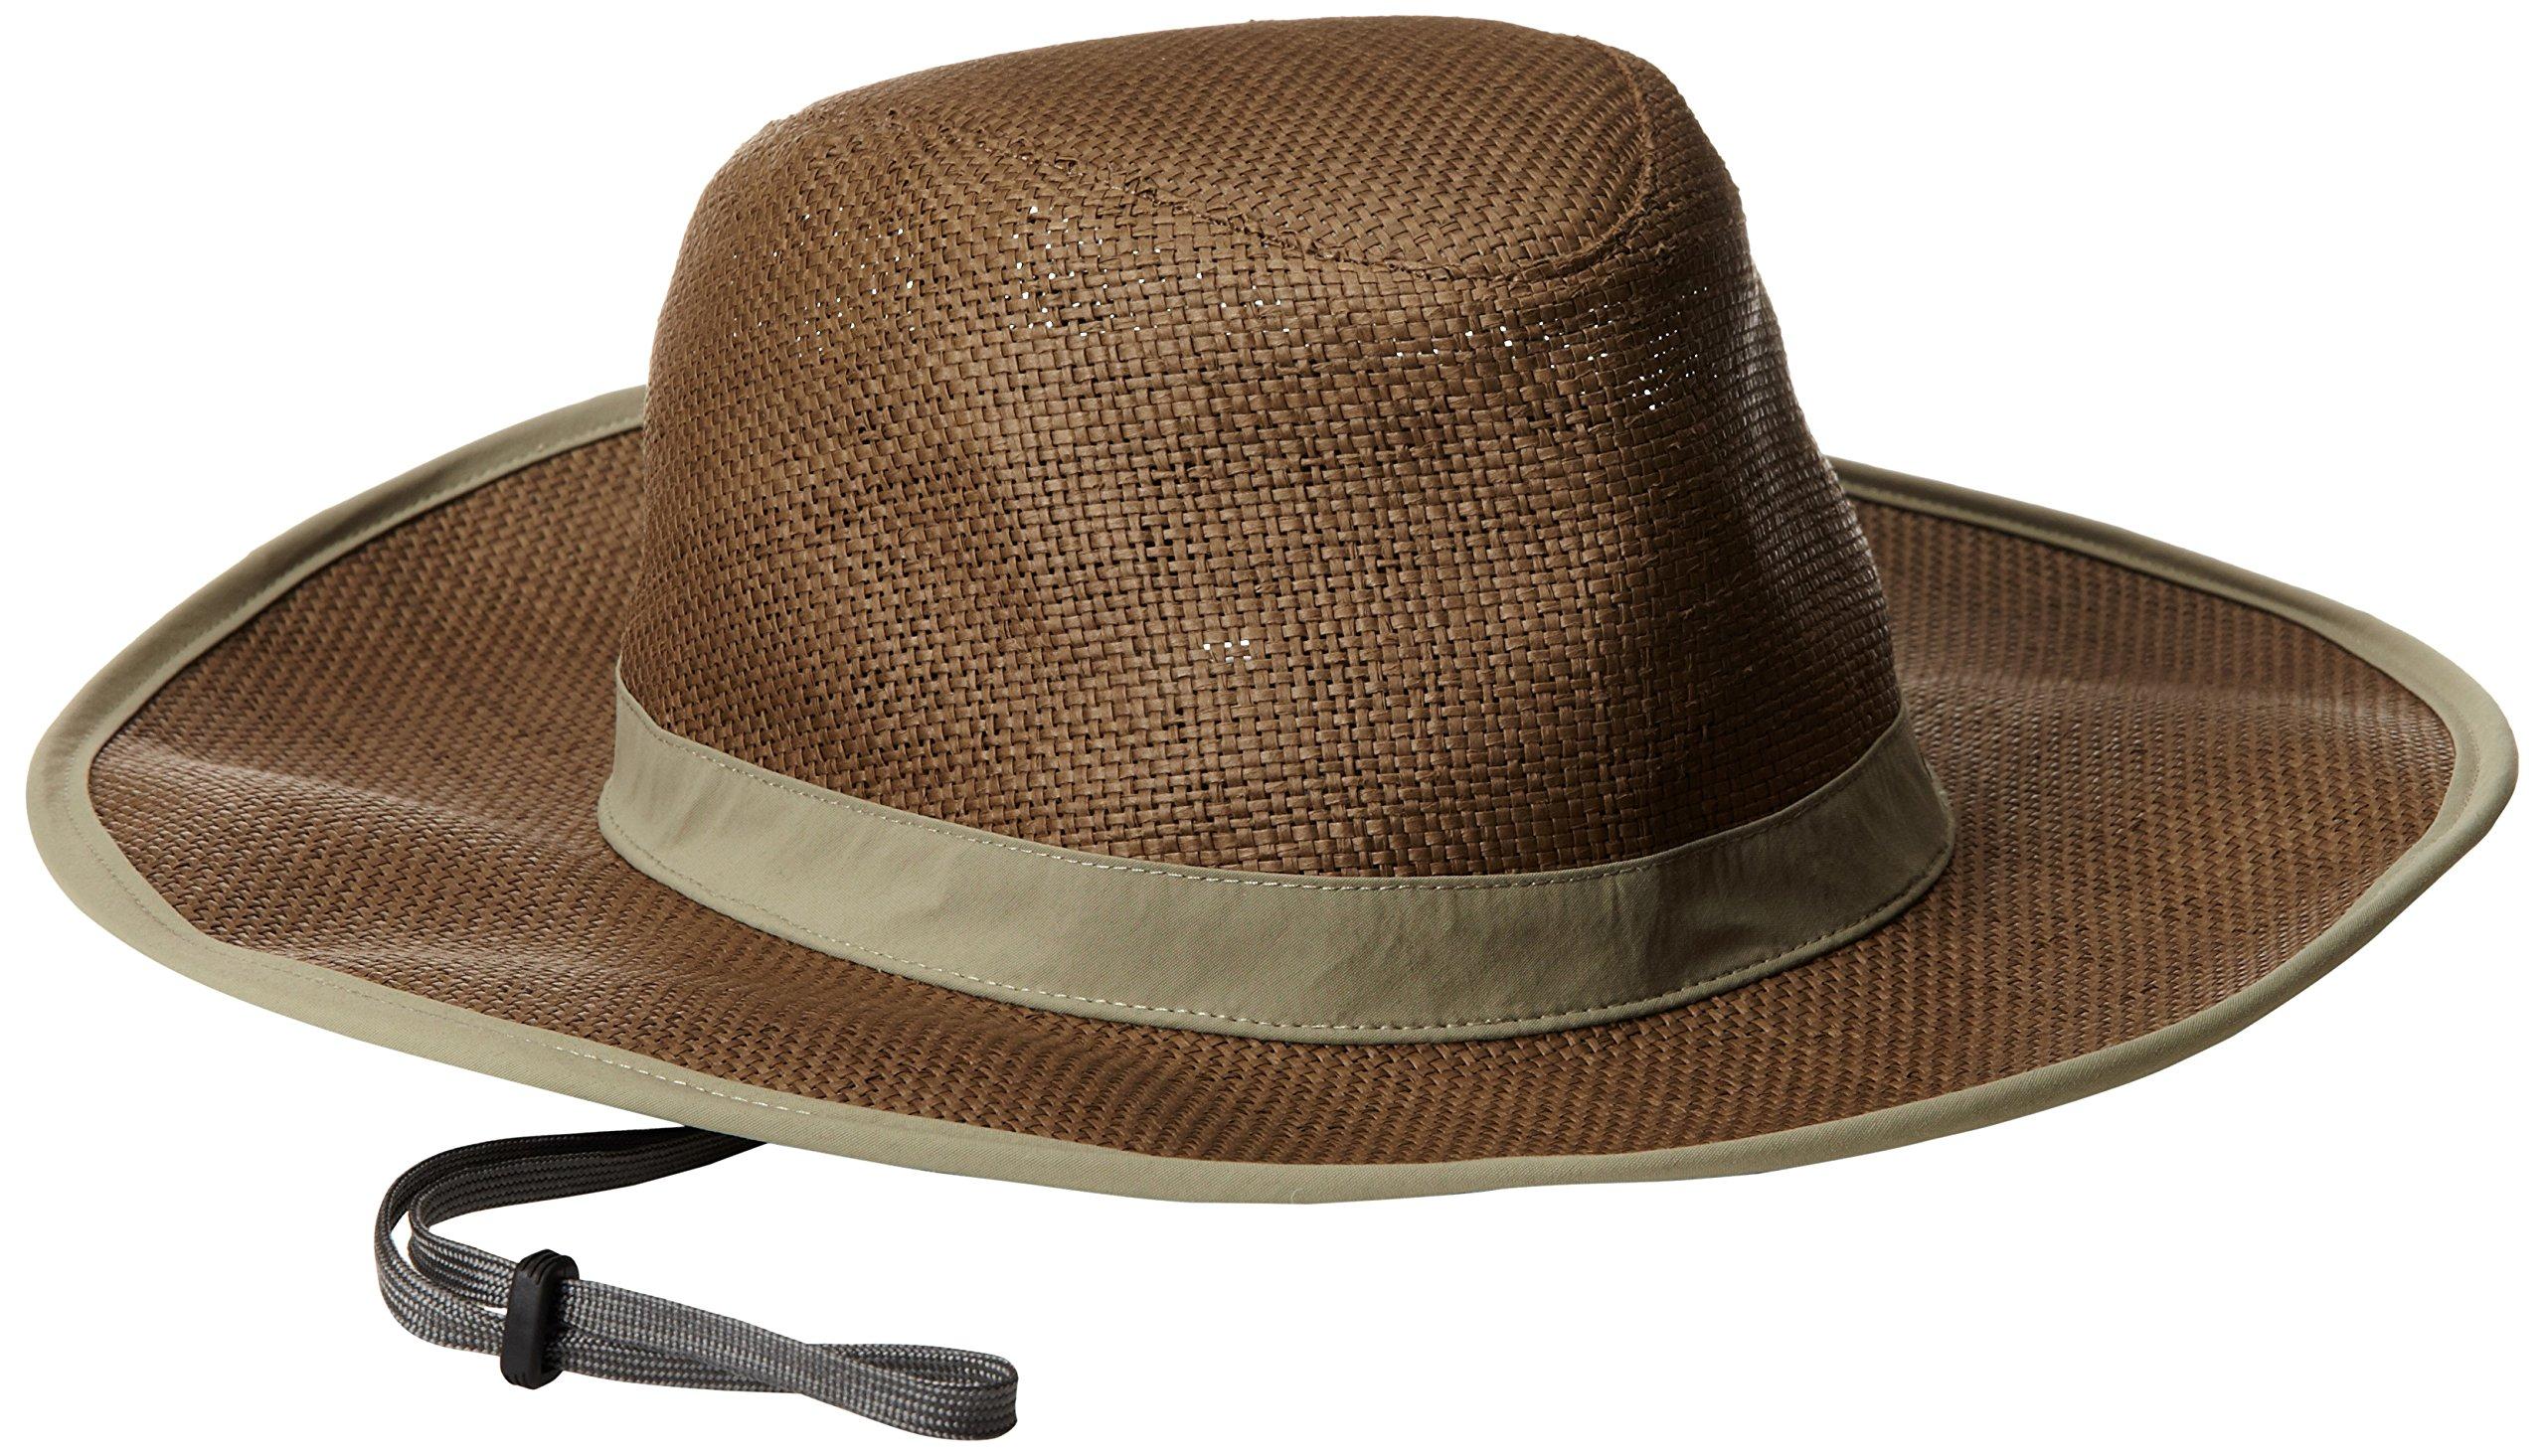 Outdoor Research Papyrus Brim Sun Hat, Walnut, Large